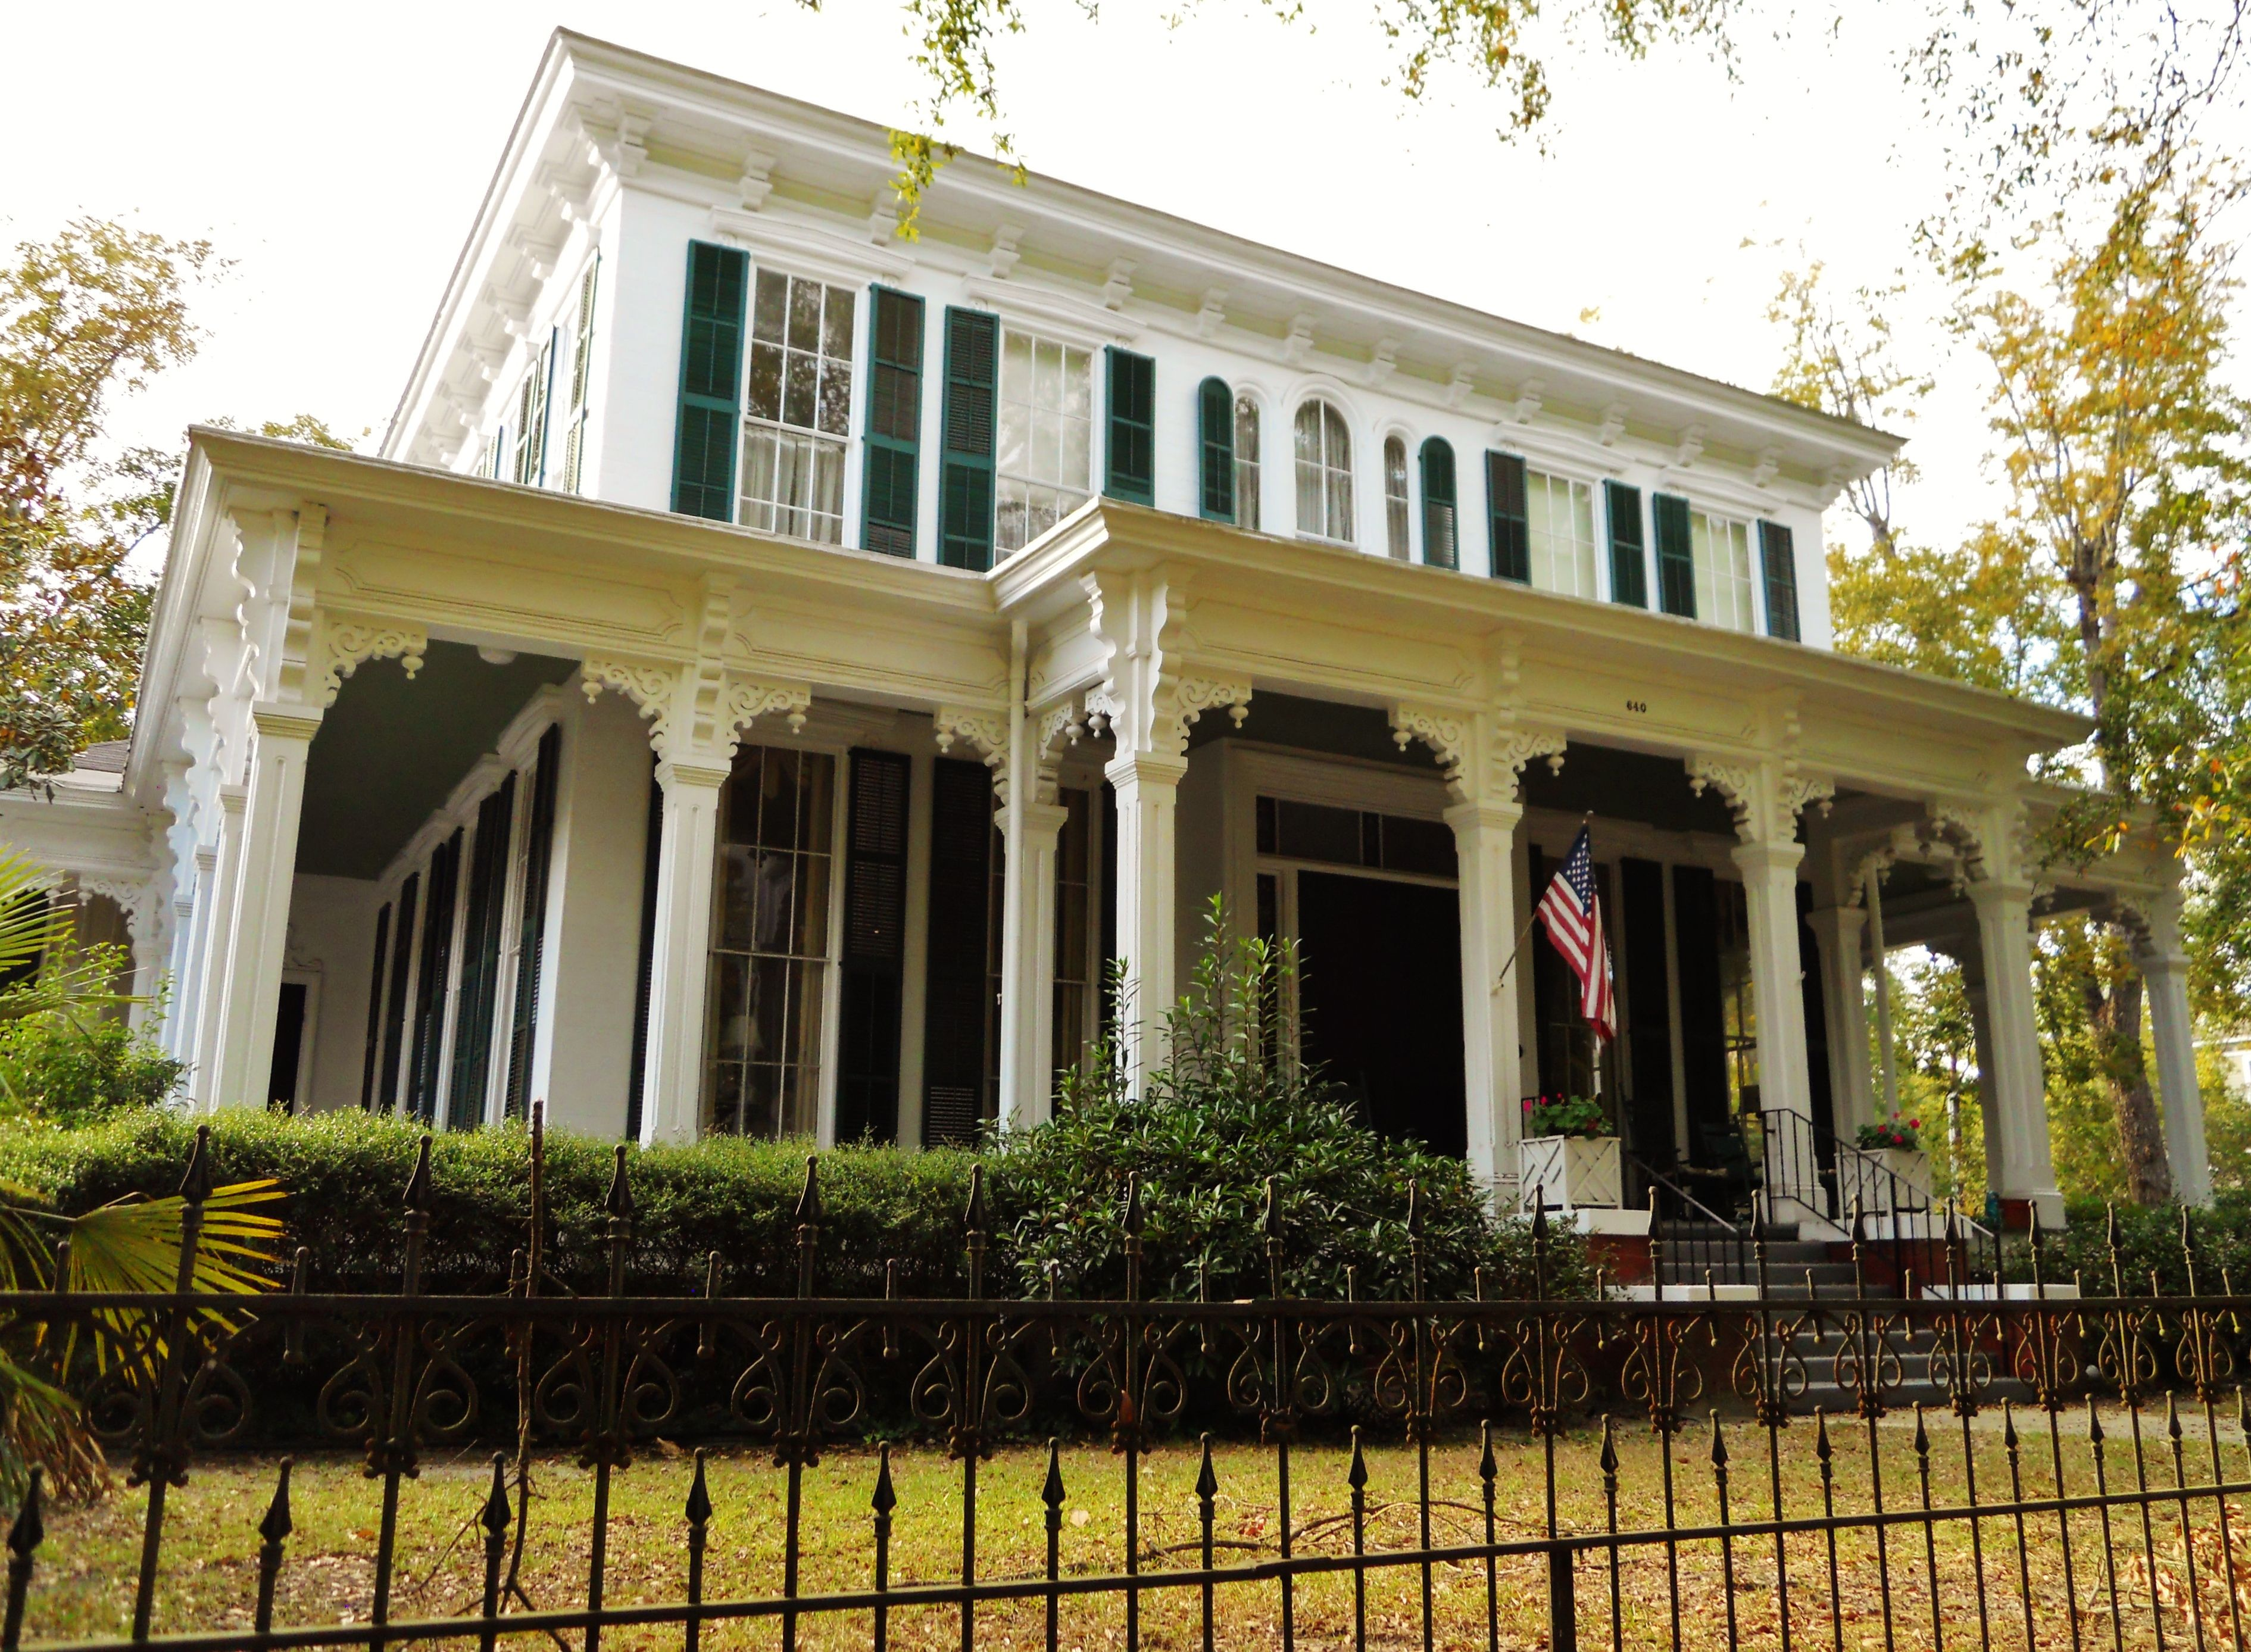 DrewryMitchellMoorer House in Eufaula, Alabama